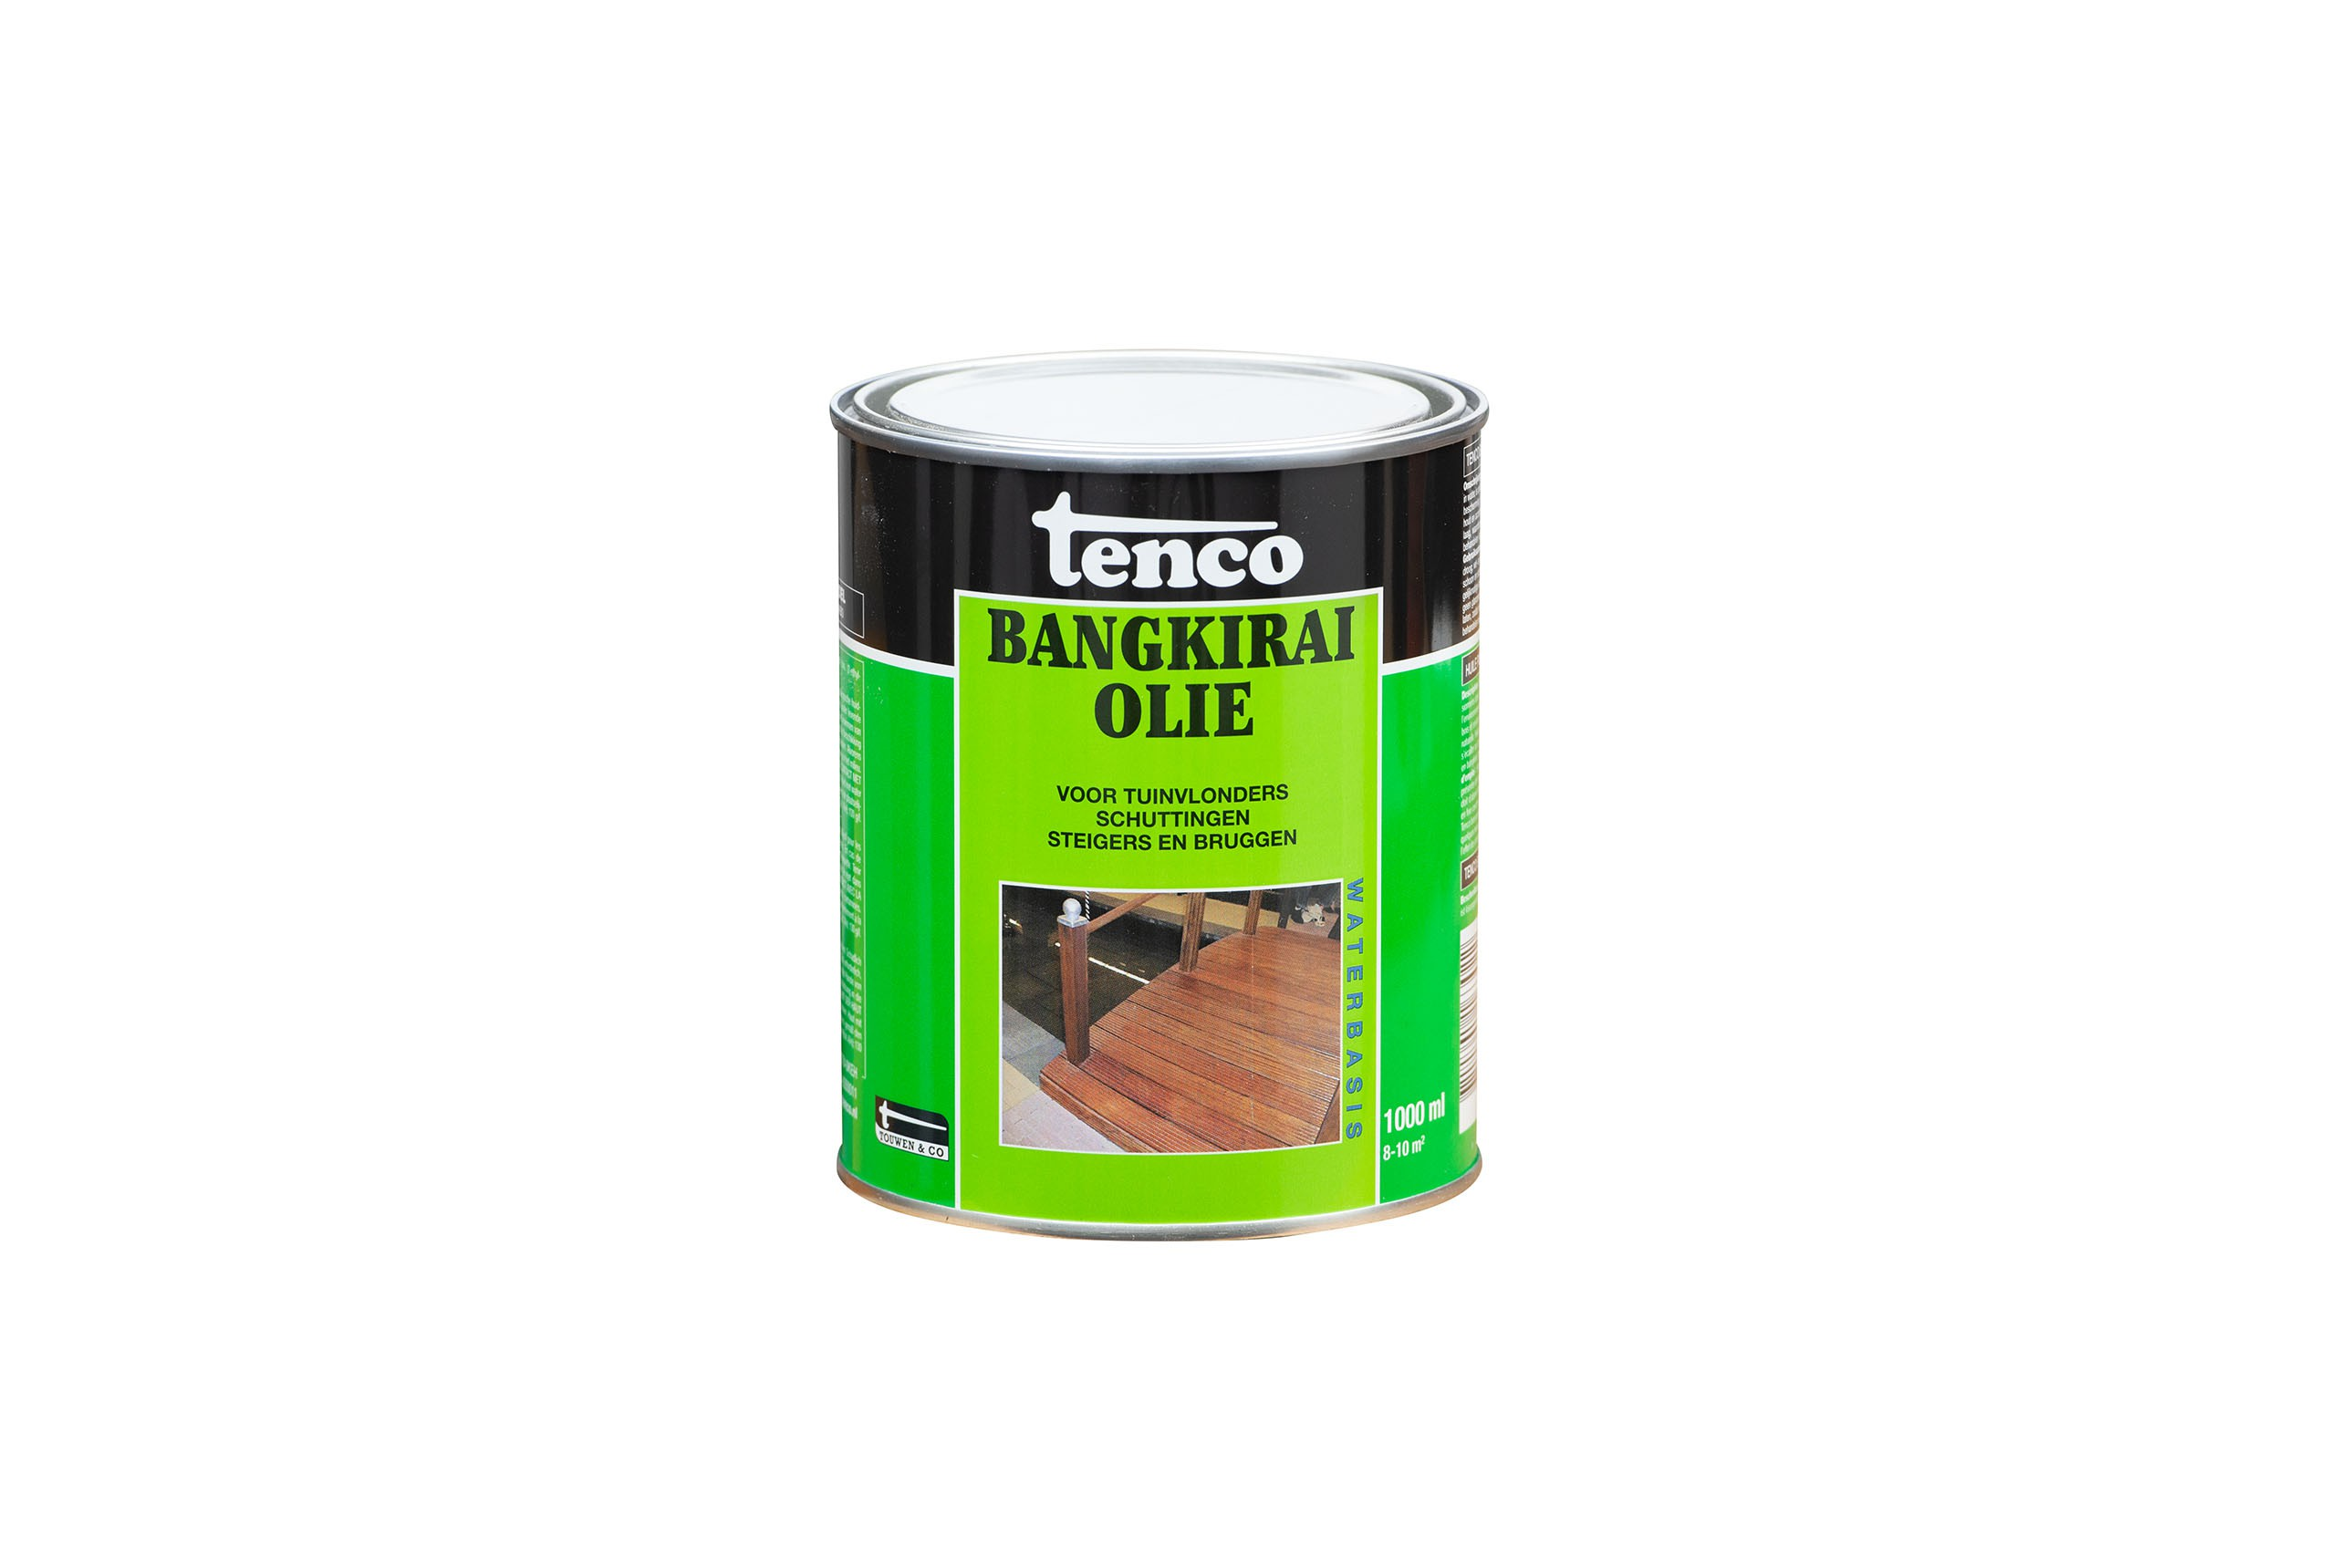 Tenco Bankirai olie  transparant 1 liter